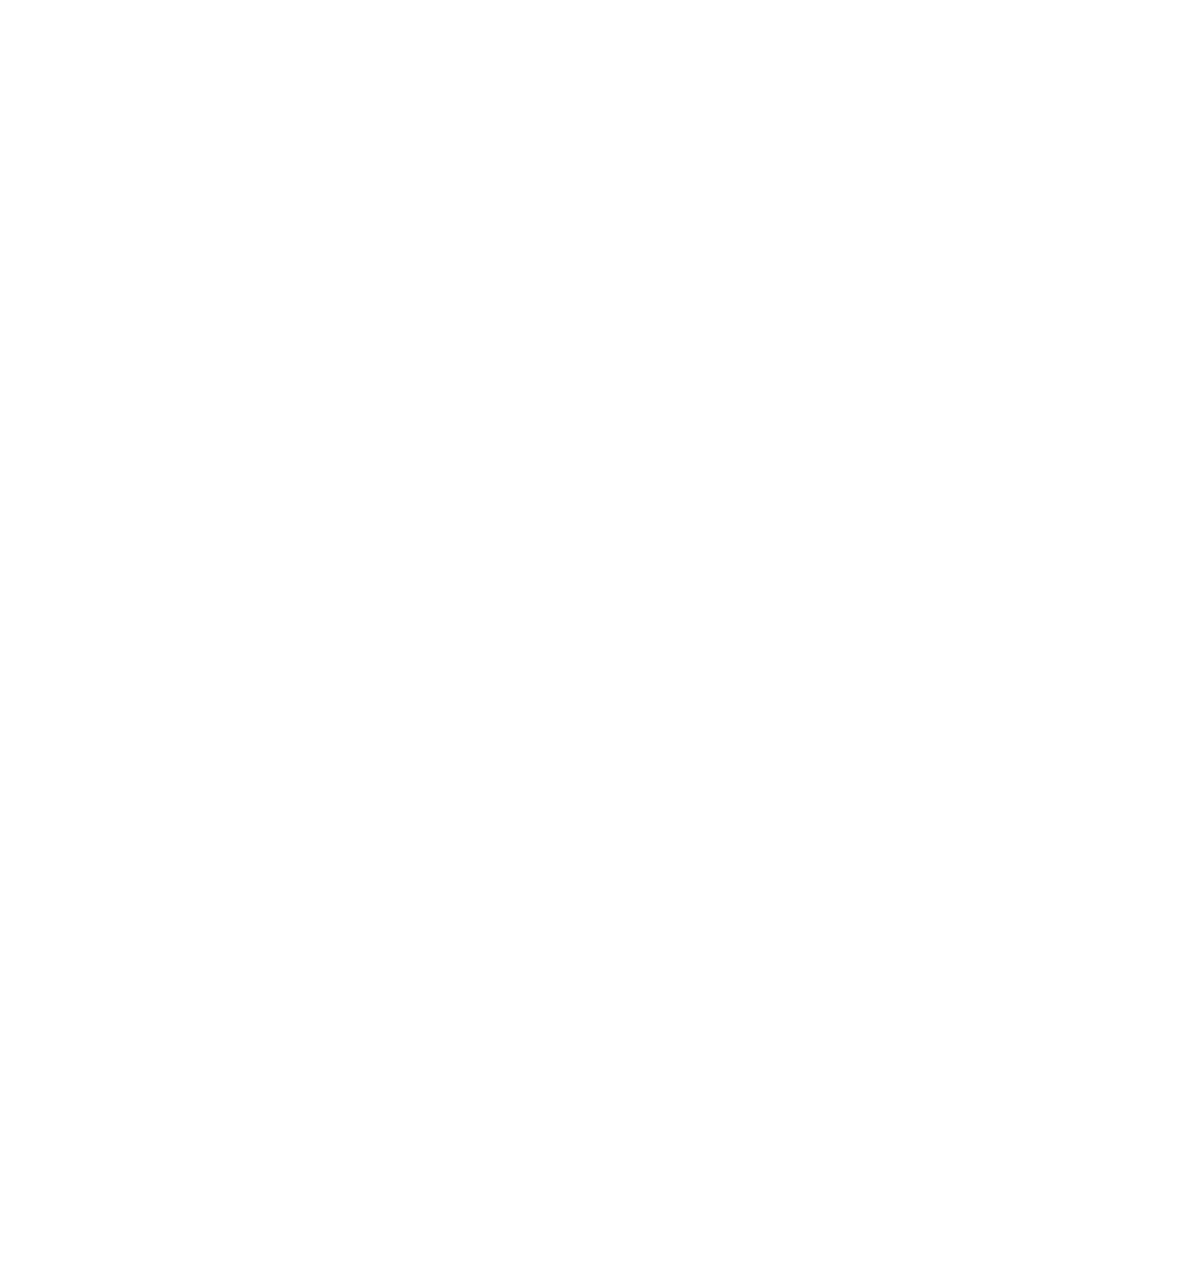 Weiv_Logo_Final_April2018-11.png